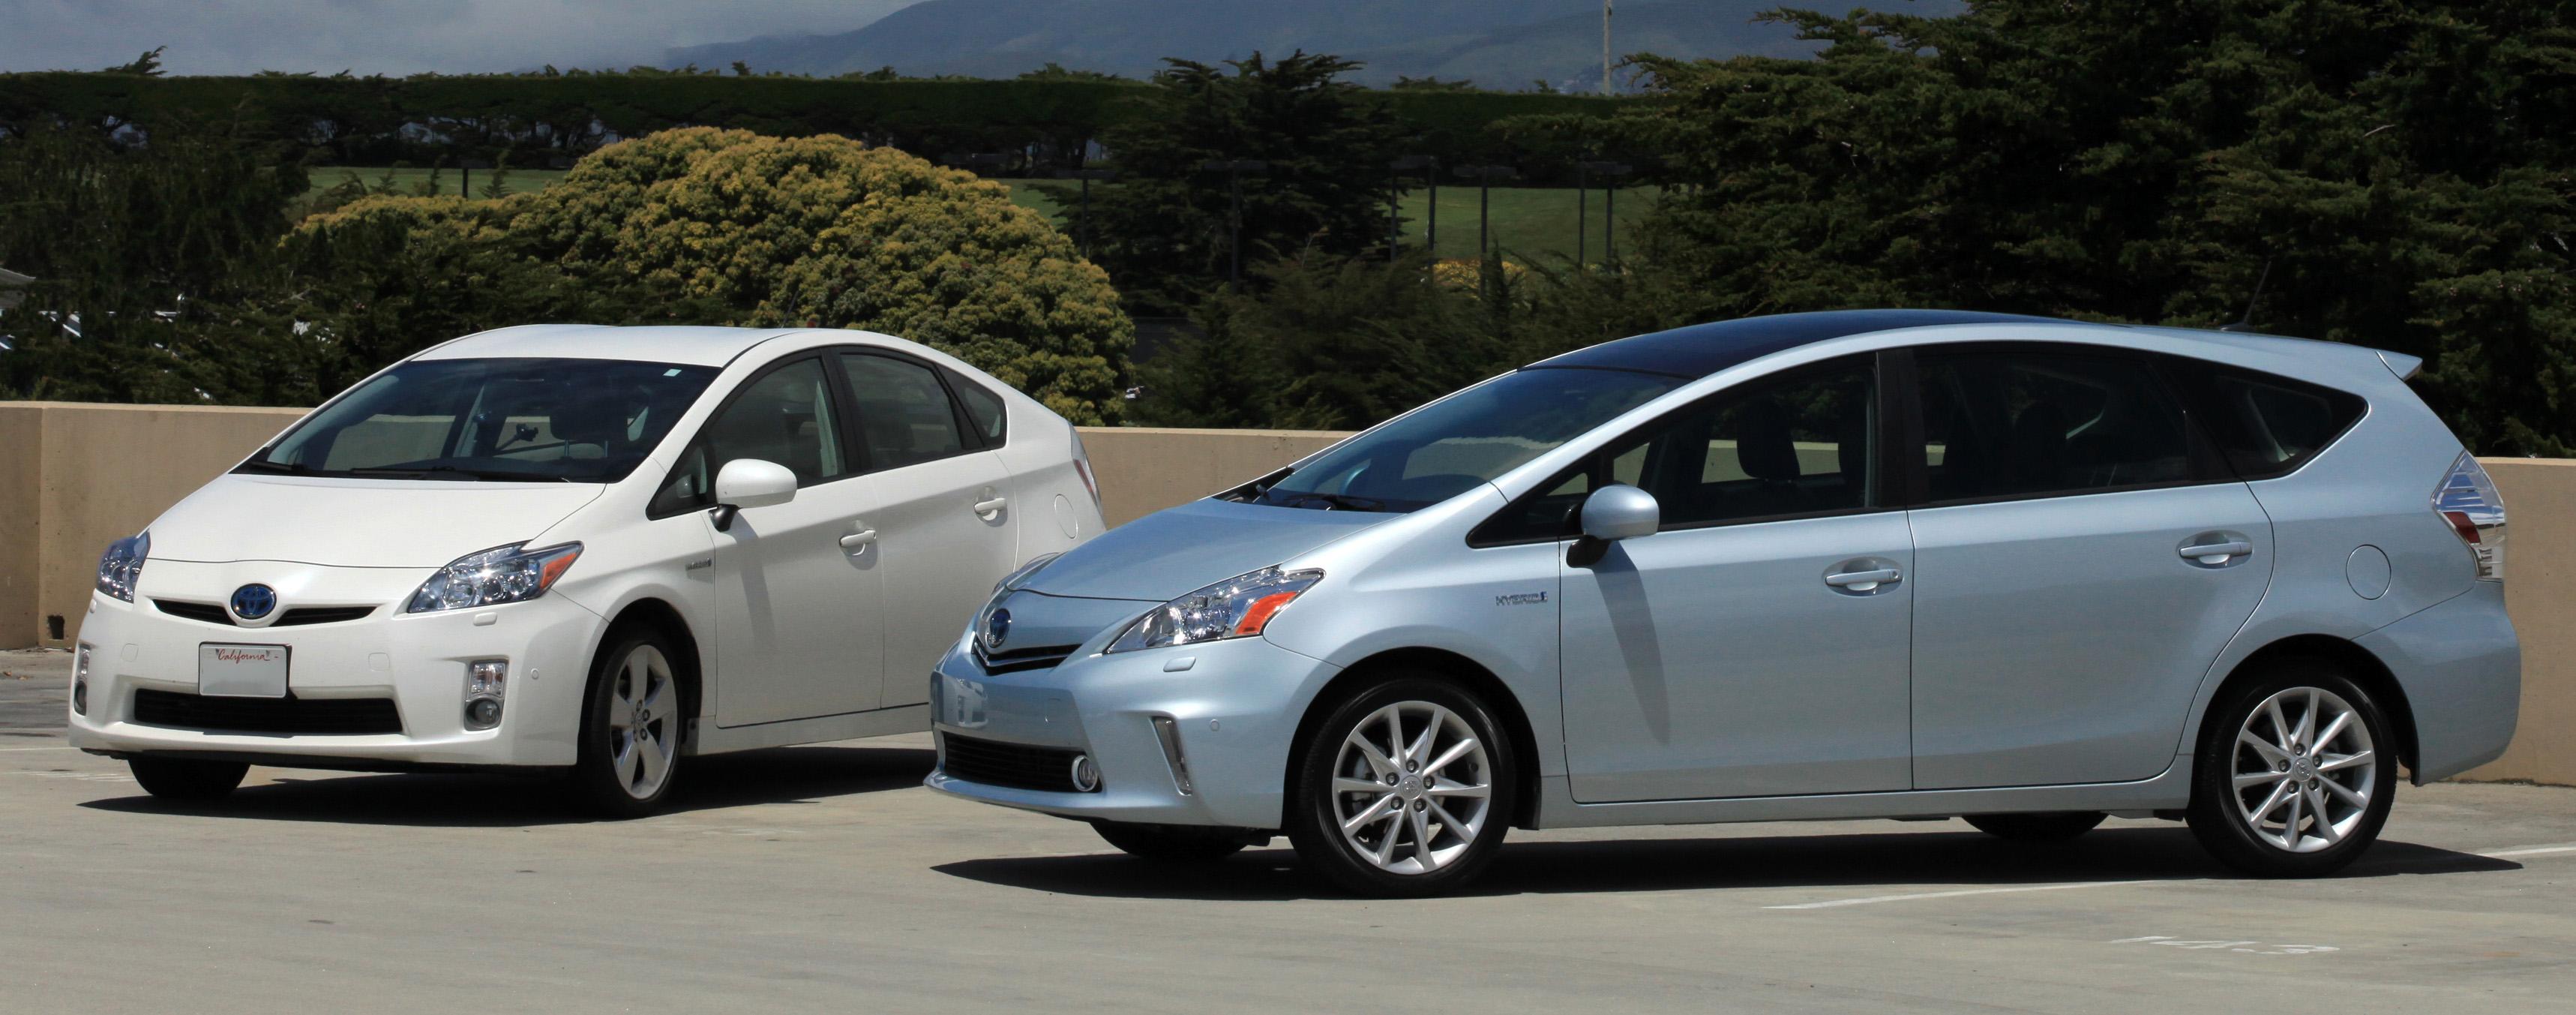 File Toyota Prius V Hybrid car family trimmed Wikimedia mons